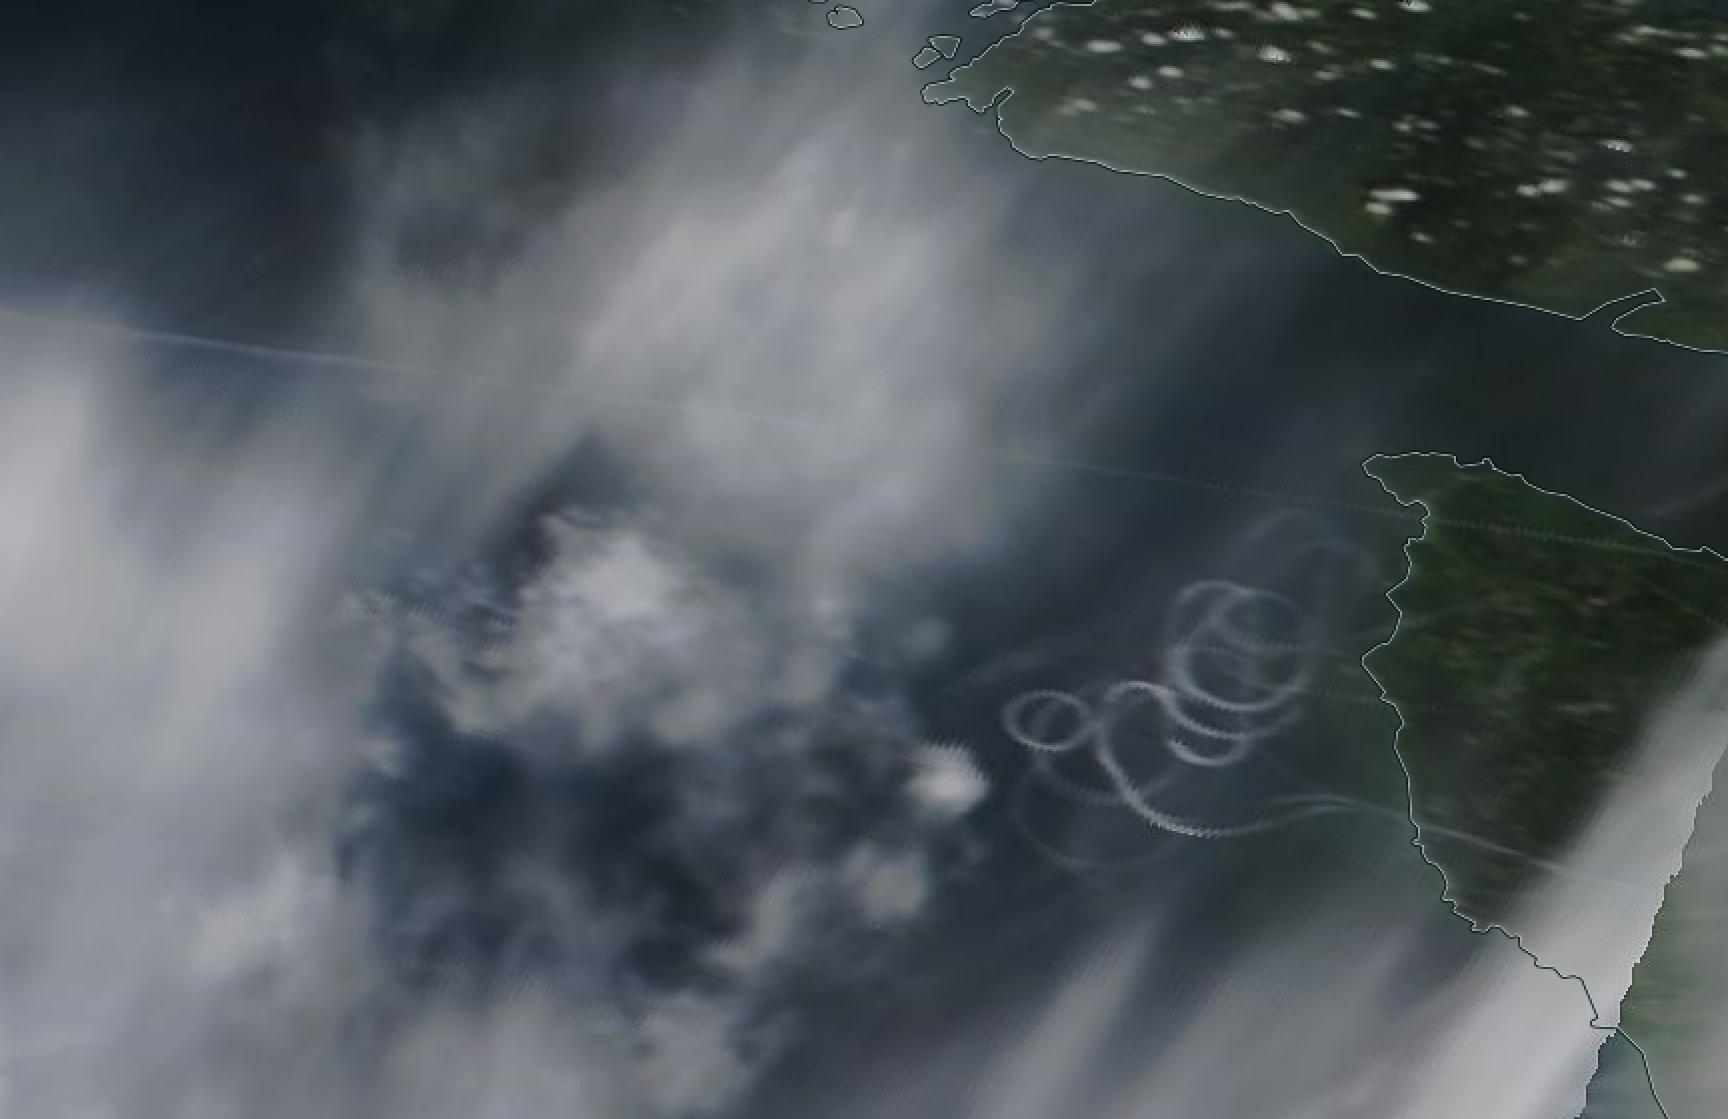 Cape Flattery, Neah Bay, Vancouver, chemtrail geoengineering 15 May 2019 ...https://go.nasa.gov/2JPJdhT